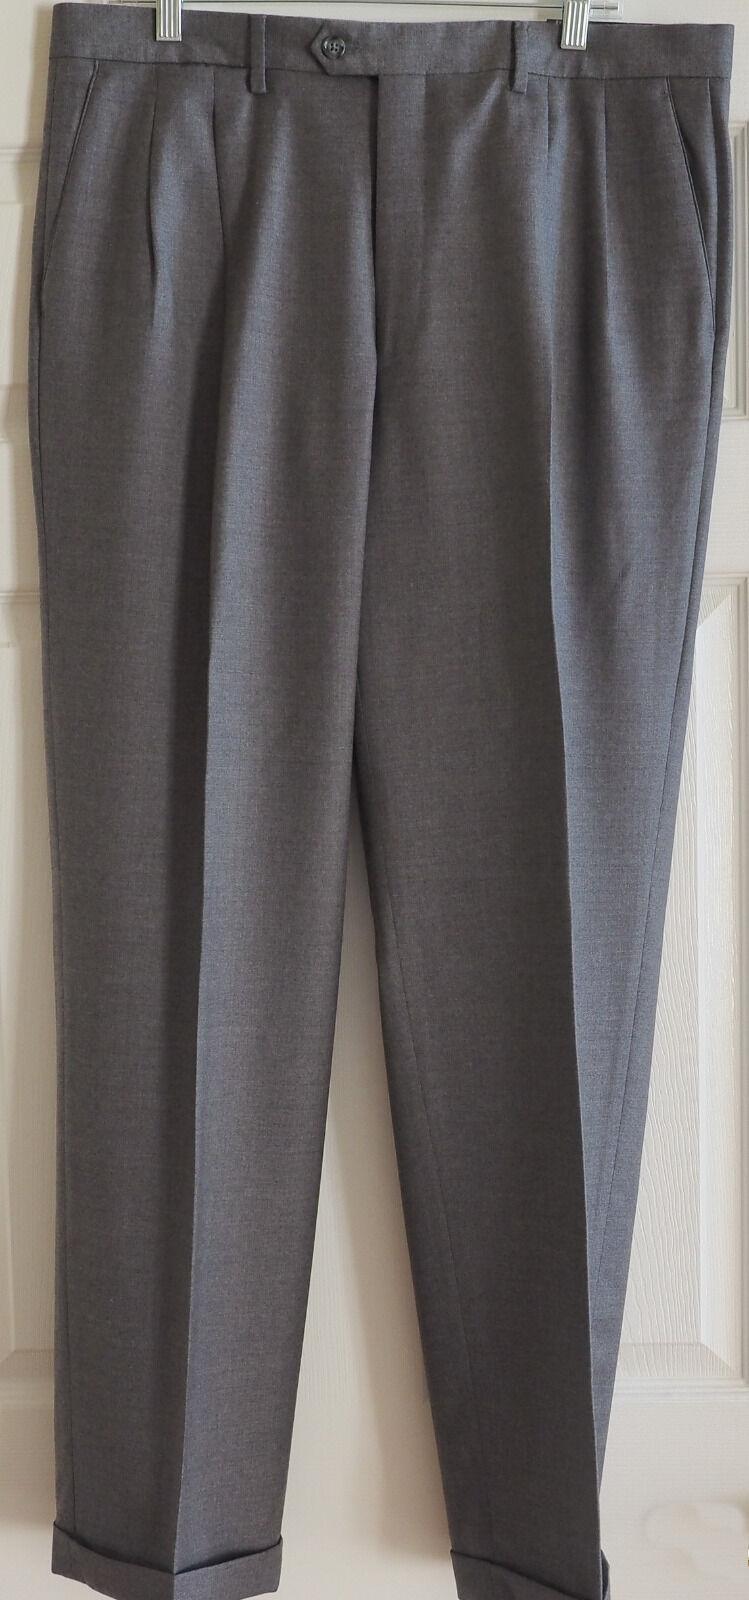 Men's Kirkland Signature Italian Wool Pleated & Cuffed Dress Pants, 36 32, NWT